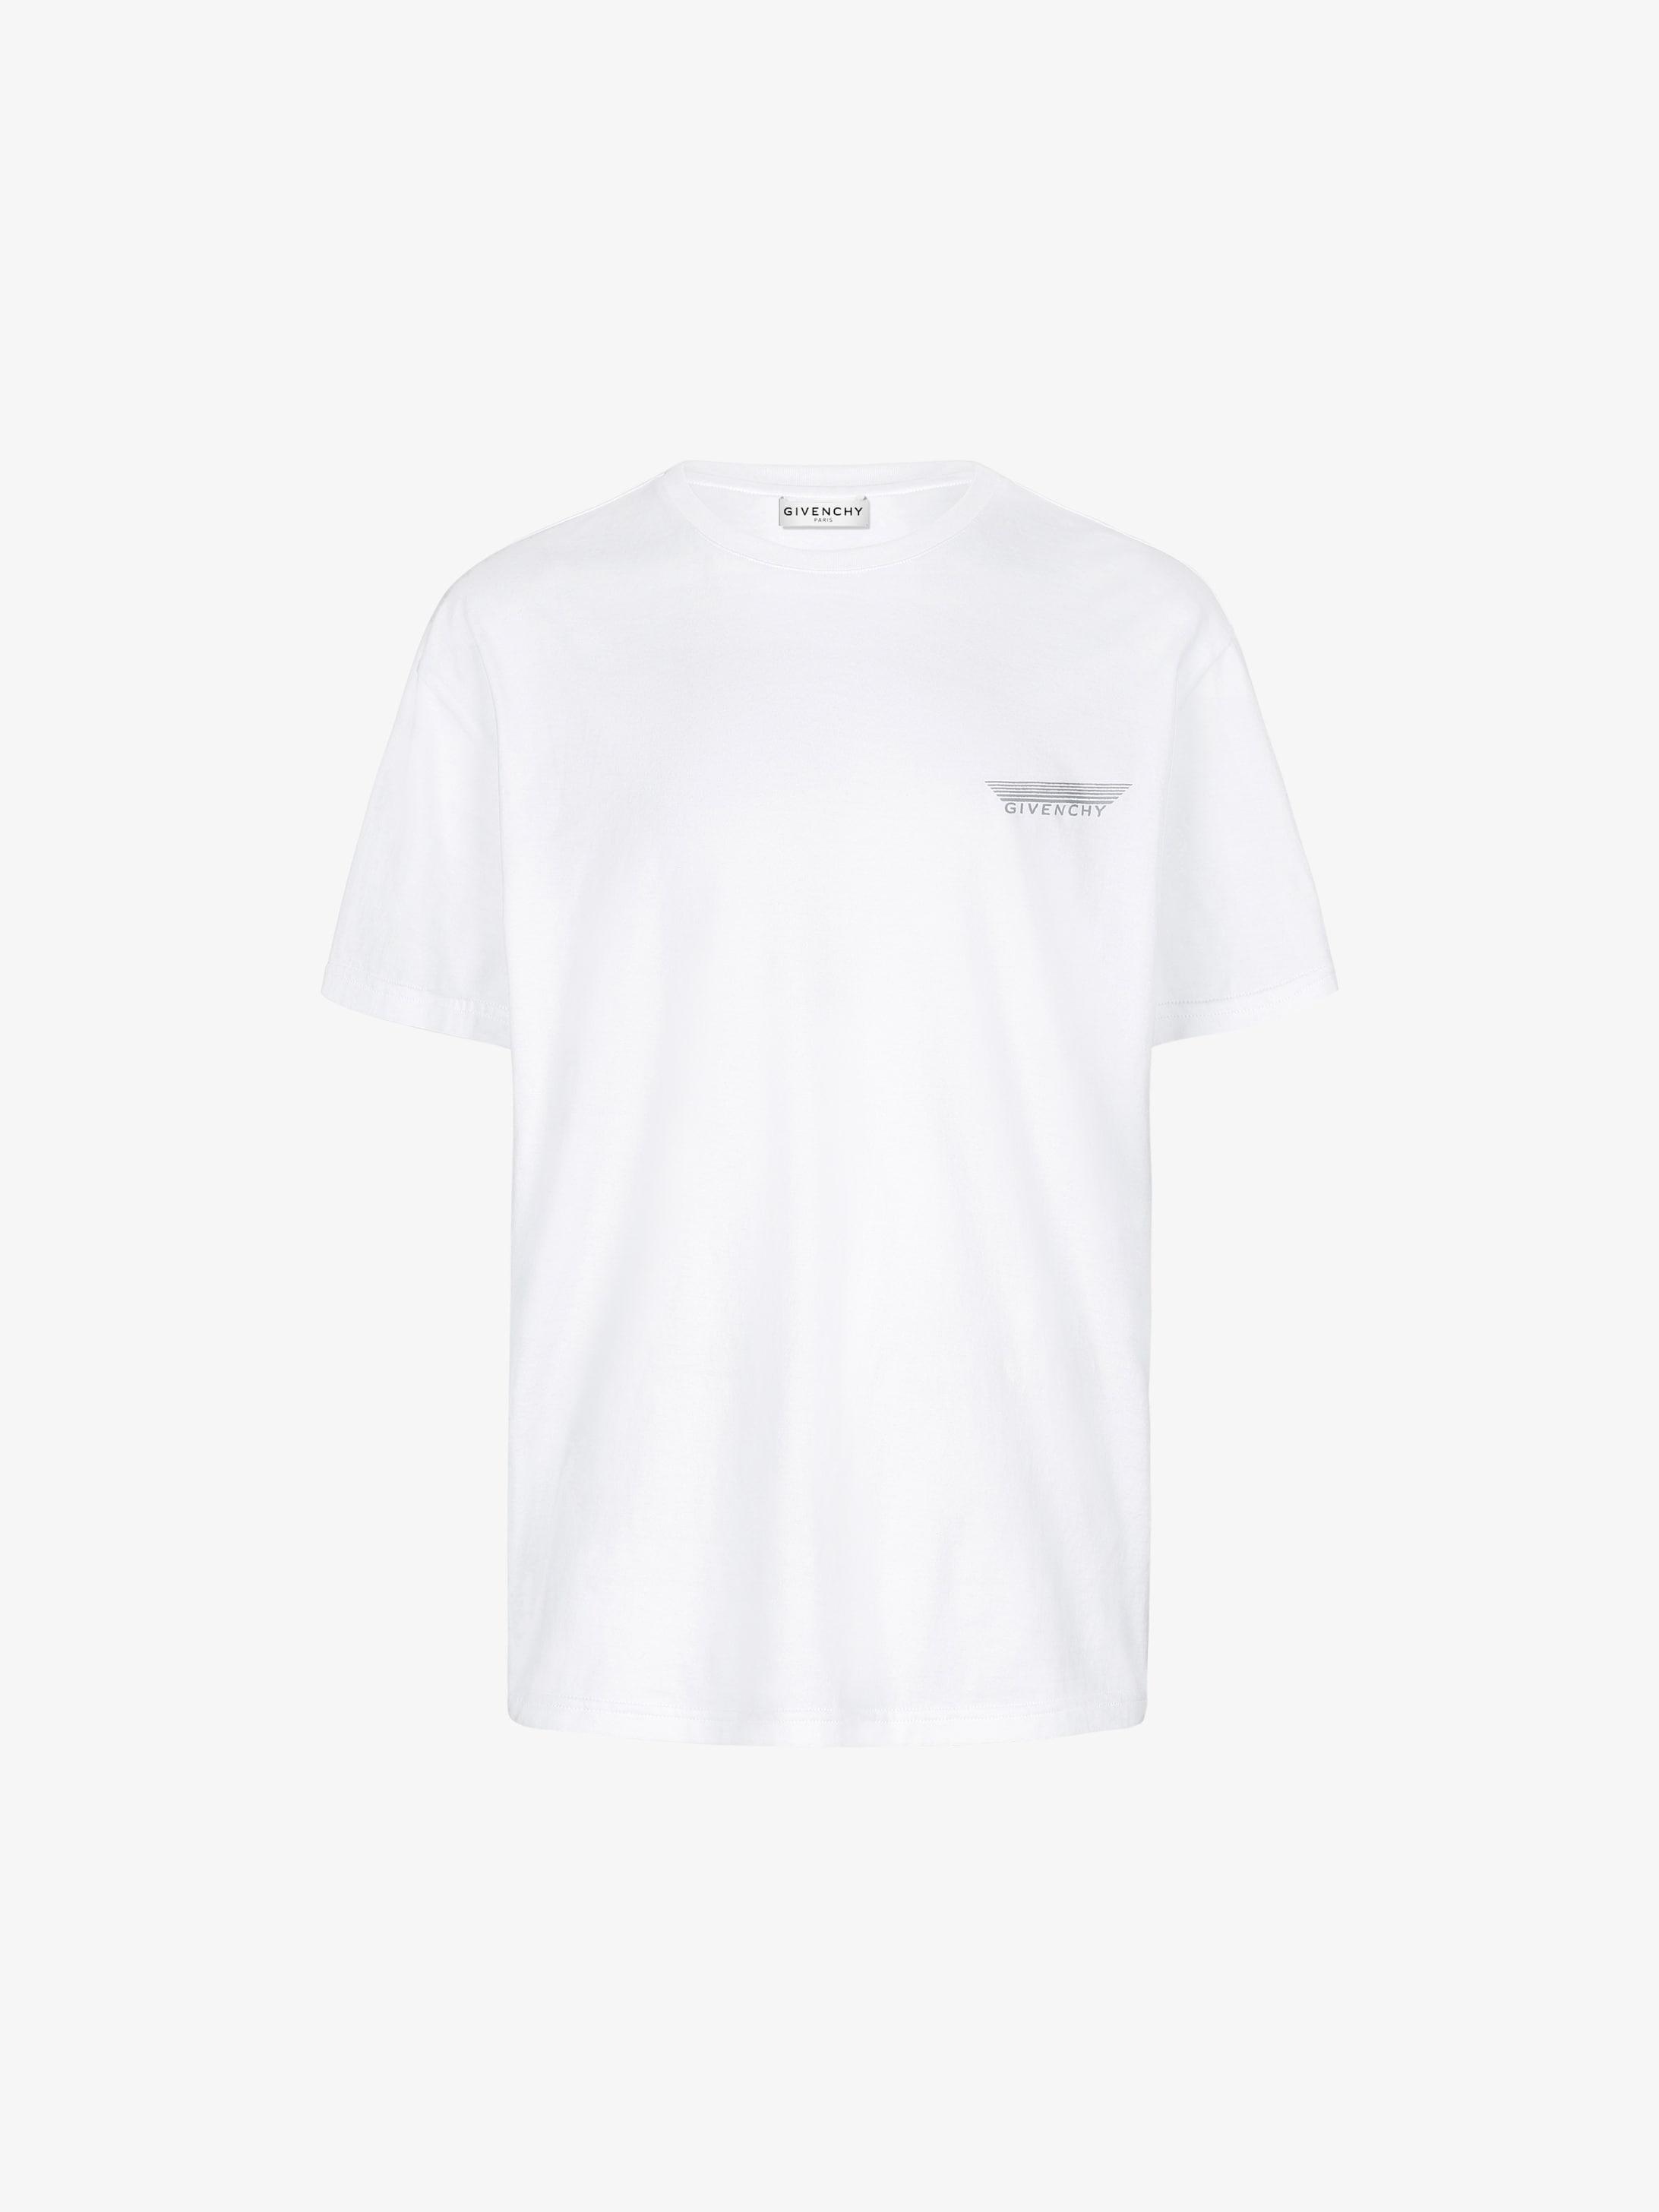 Peony printed t-shirt